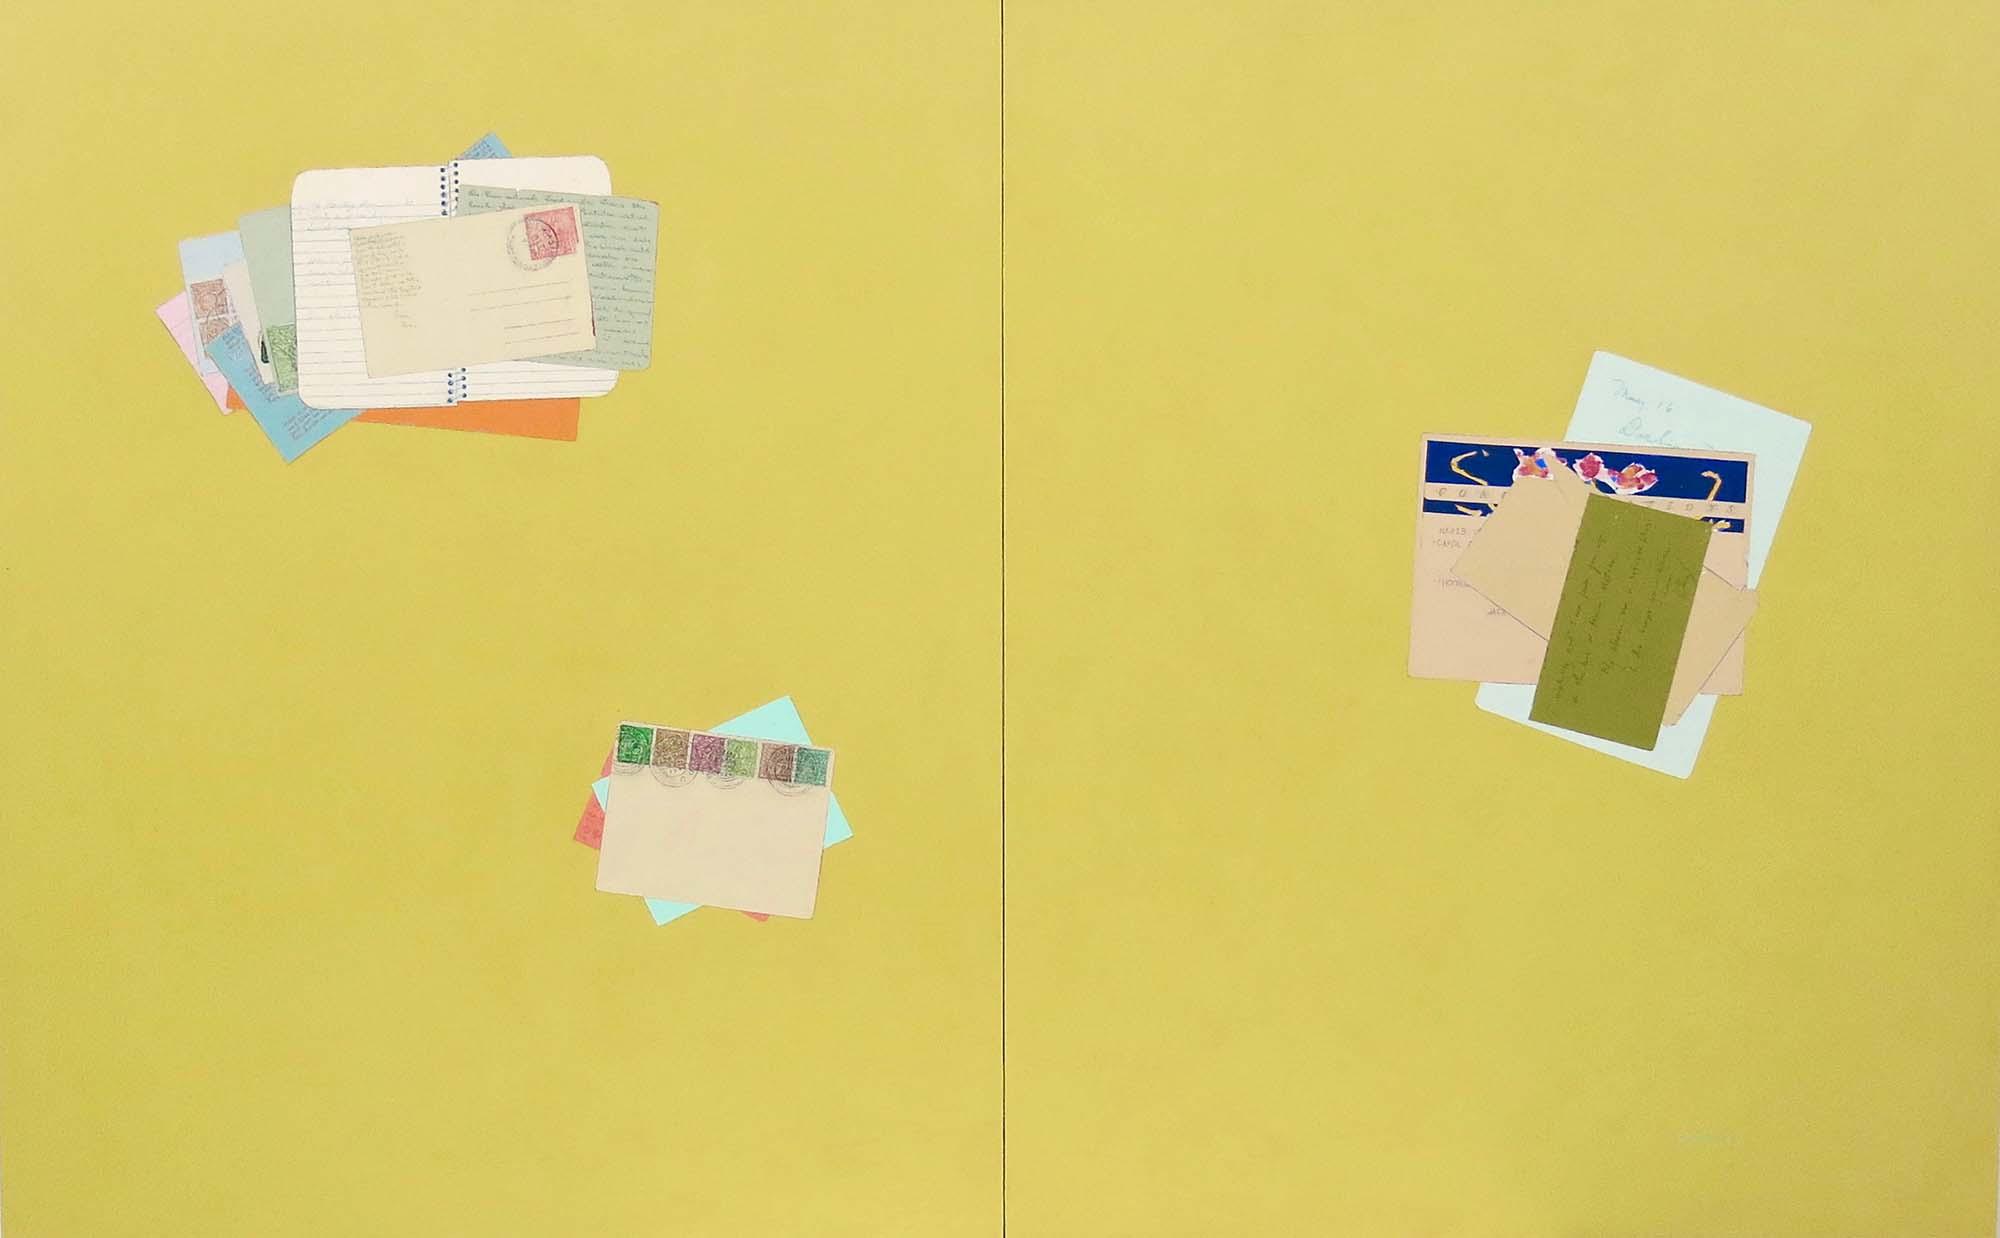 Fern T. Apfel, The telegram, Acrylic & pen on 2 wood panels, 30